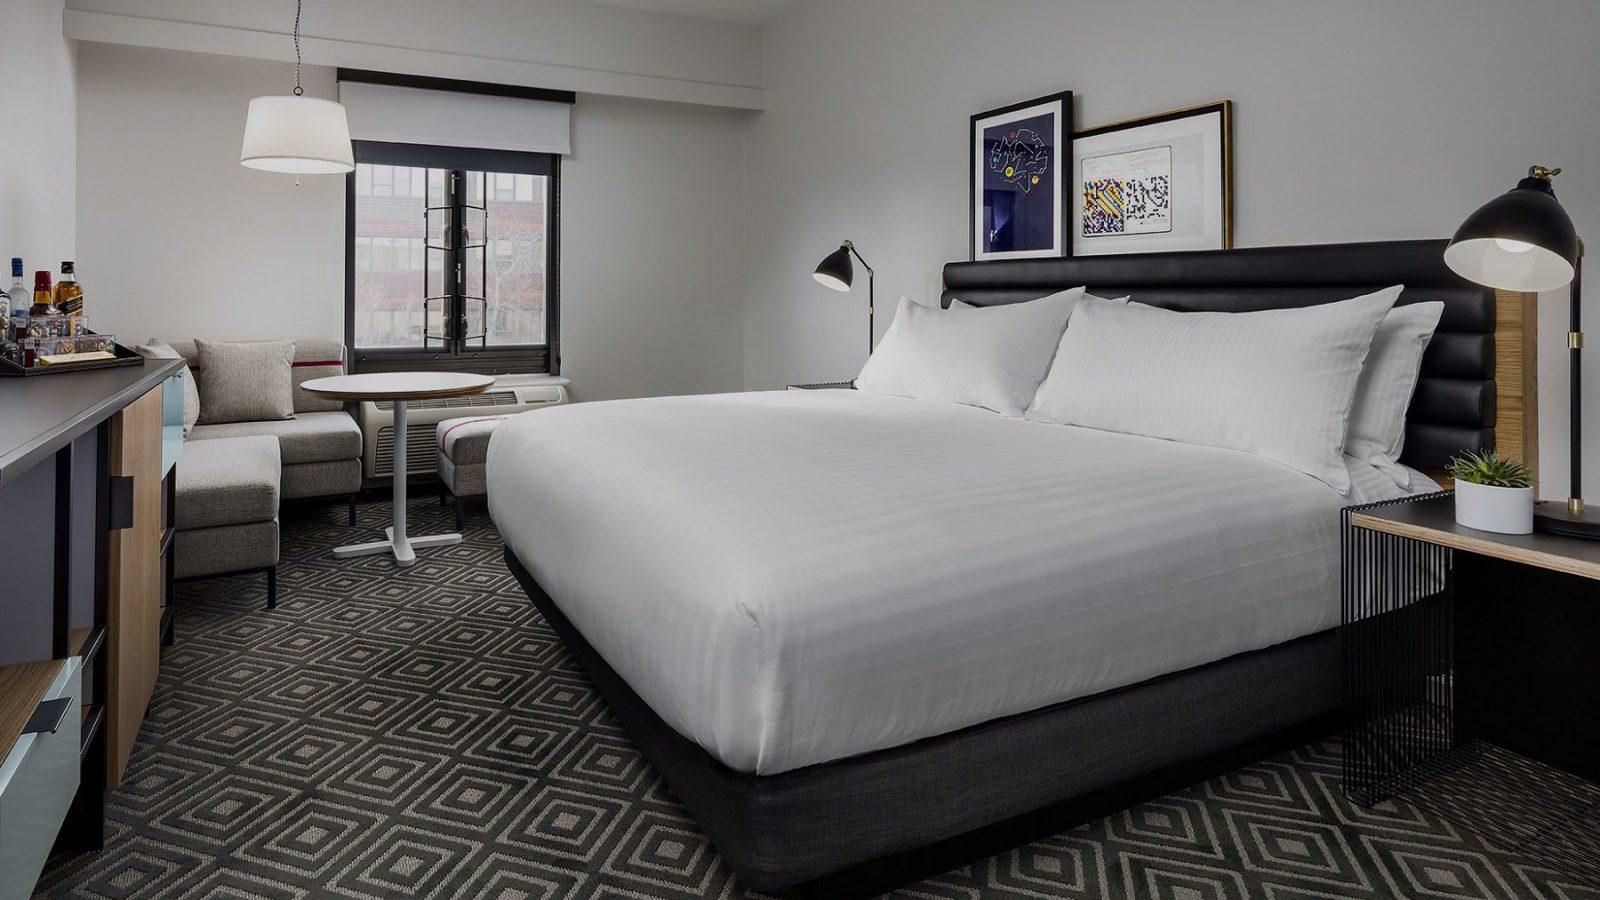 Freepoint Hotel Cambridge